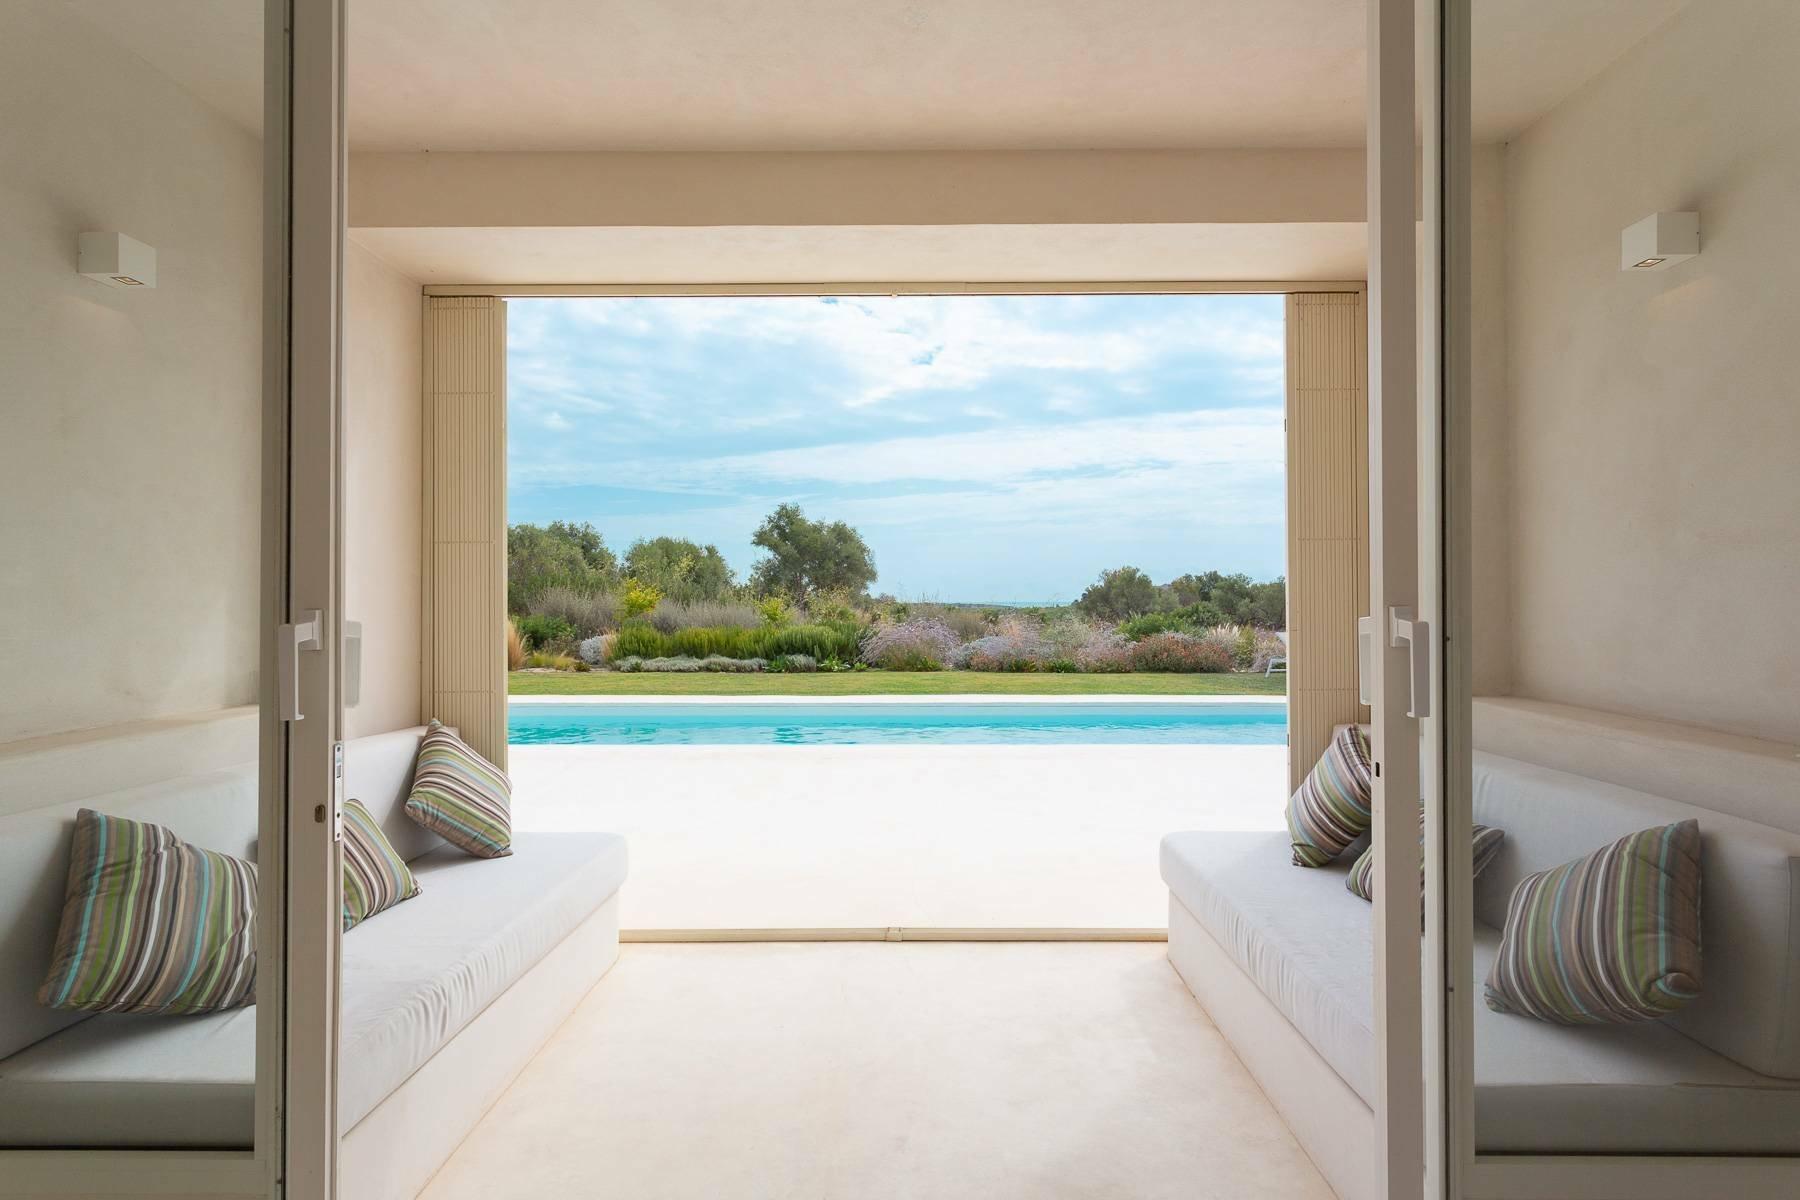 House in Sicilia, Italy 1